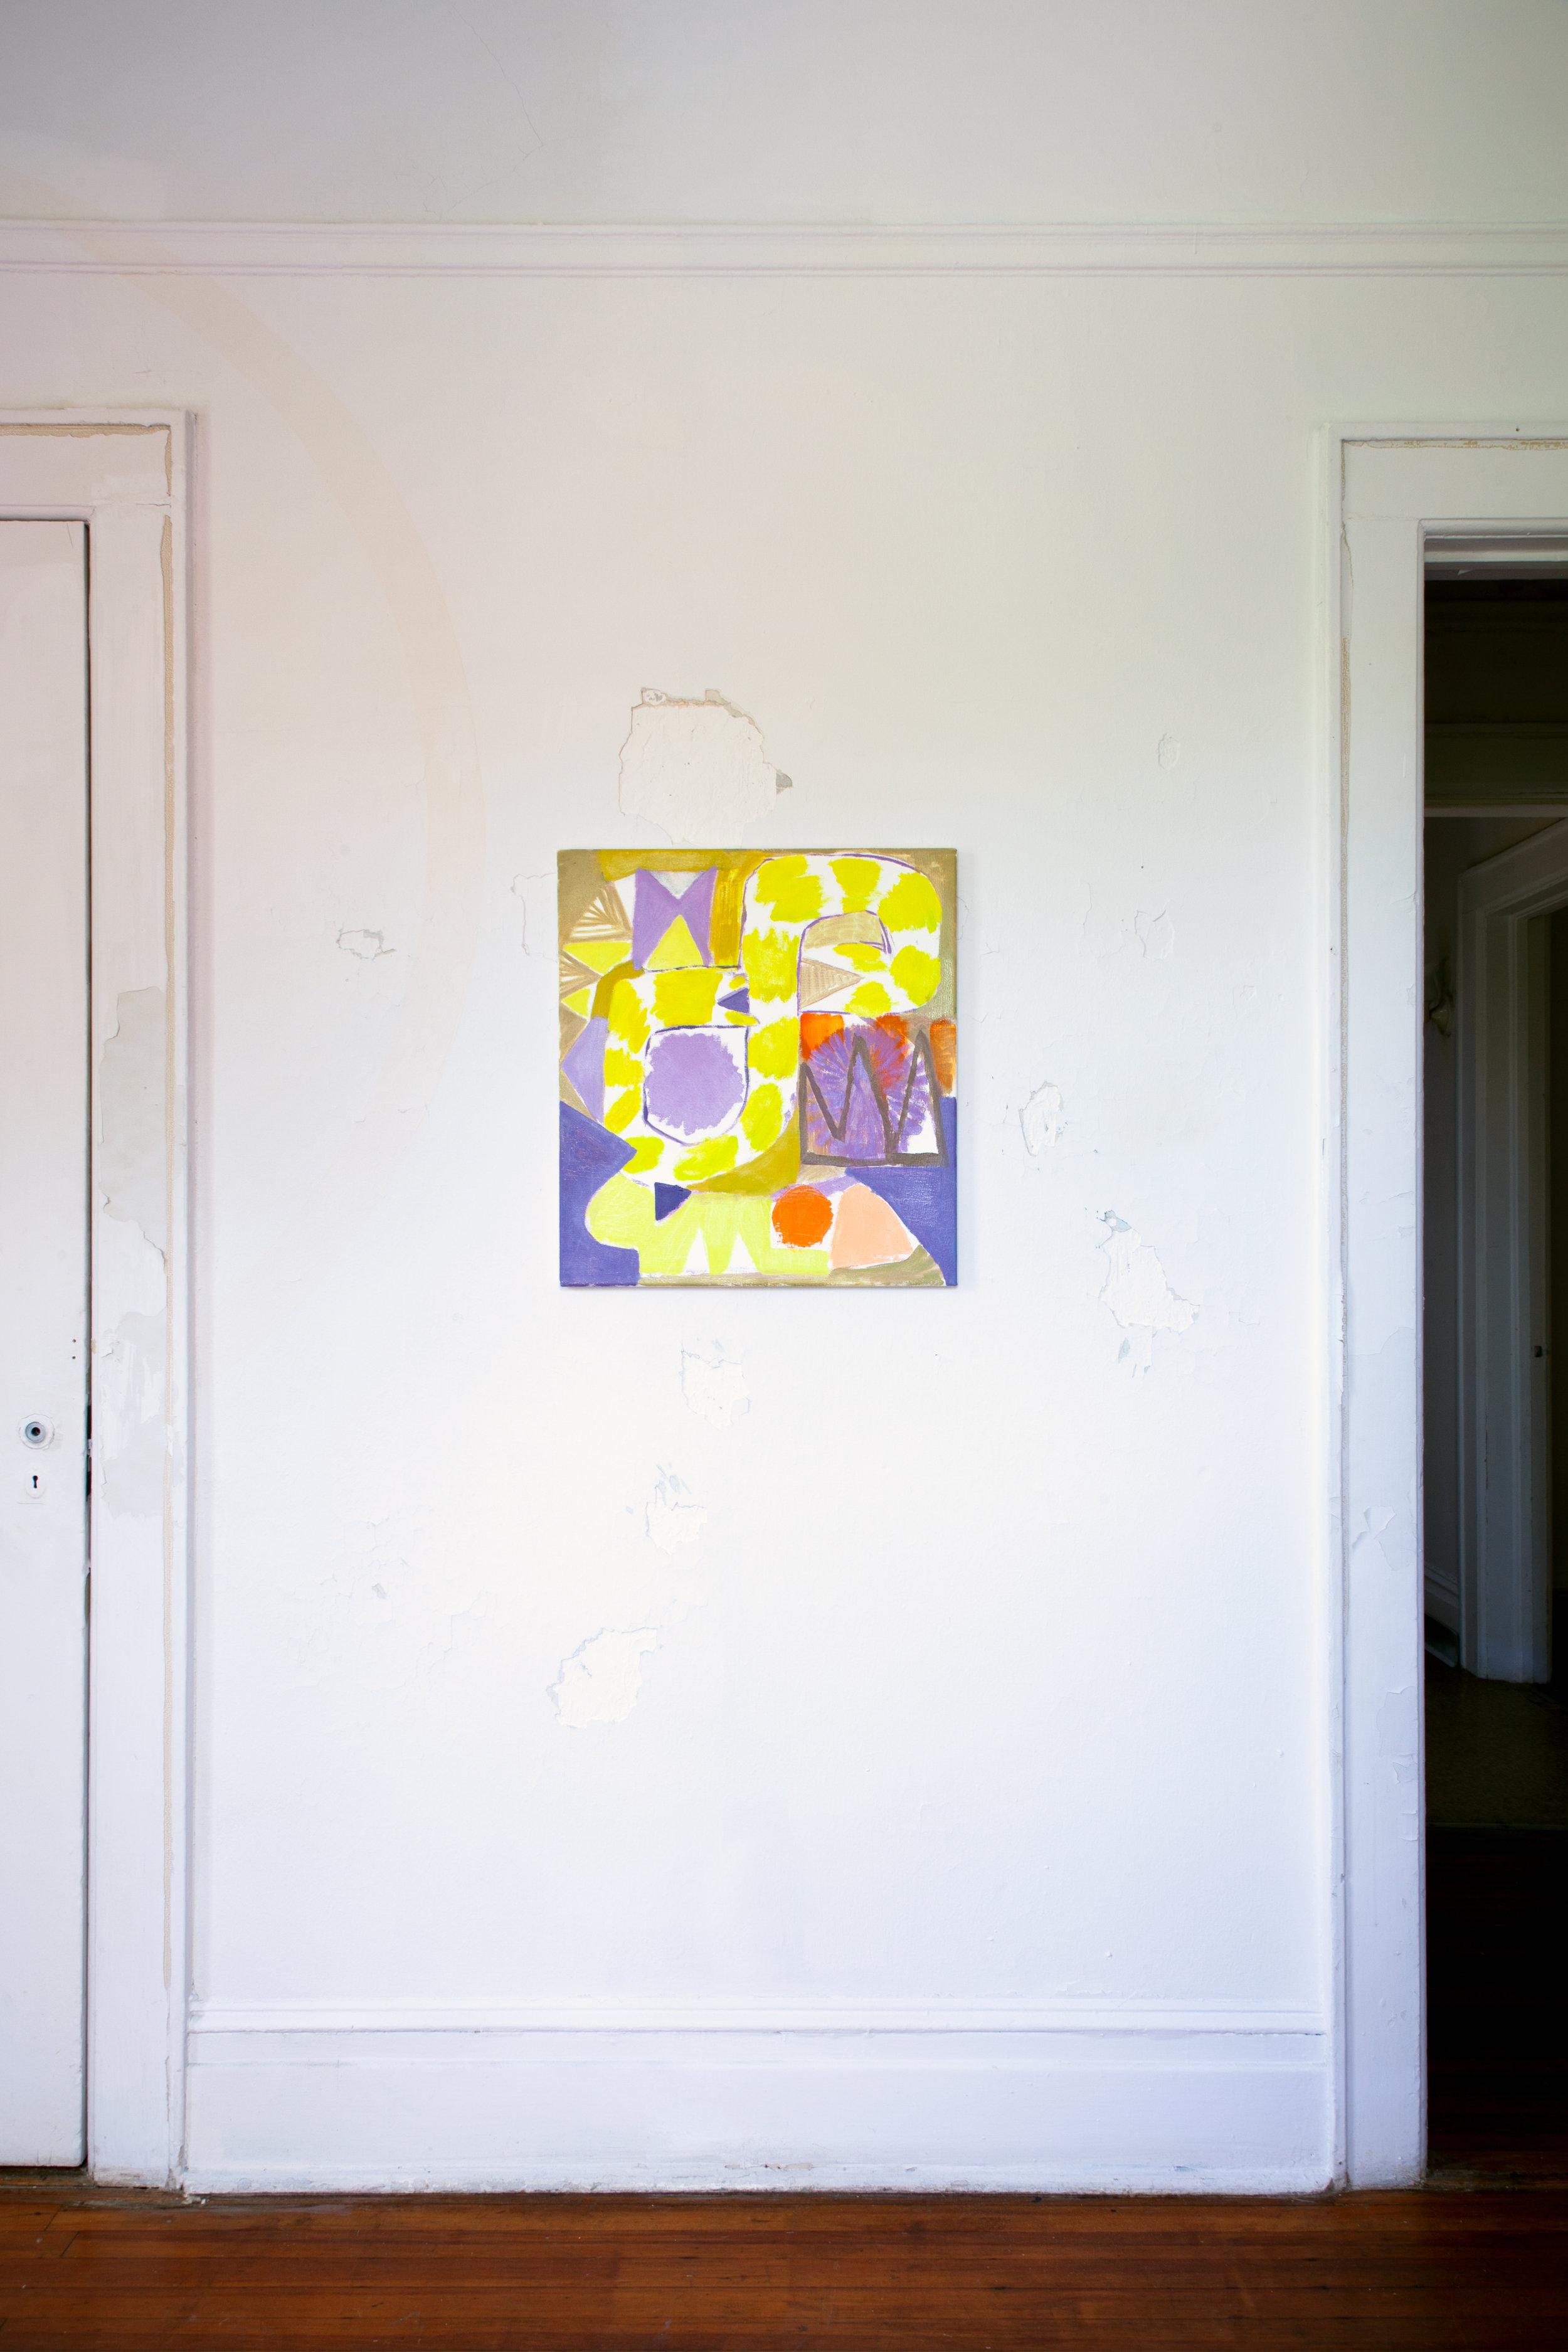 Meghan_Brady-NADA_House-2019-installation_view_09.jpg